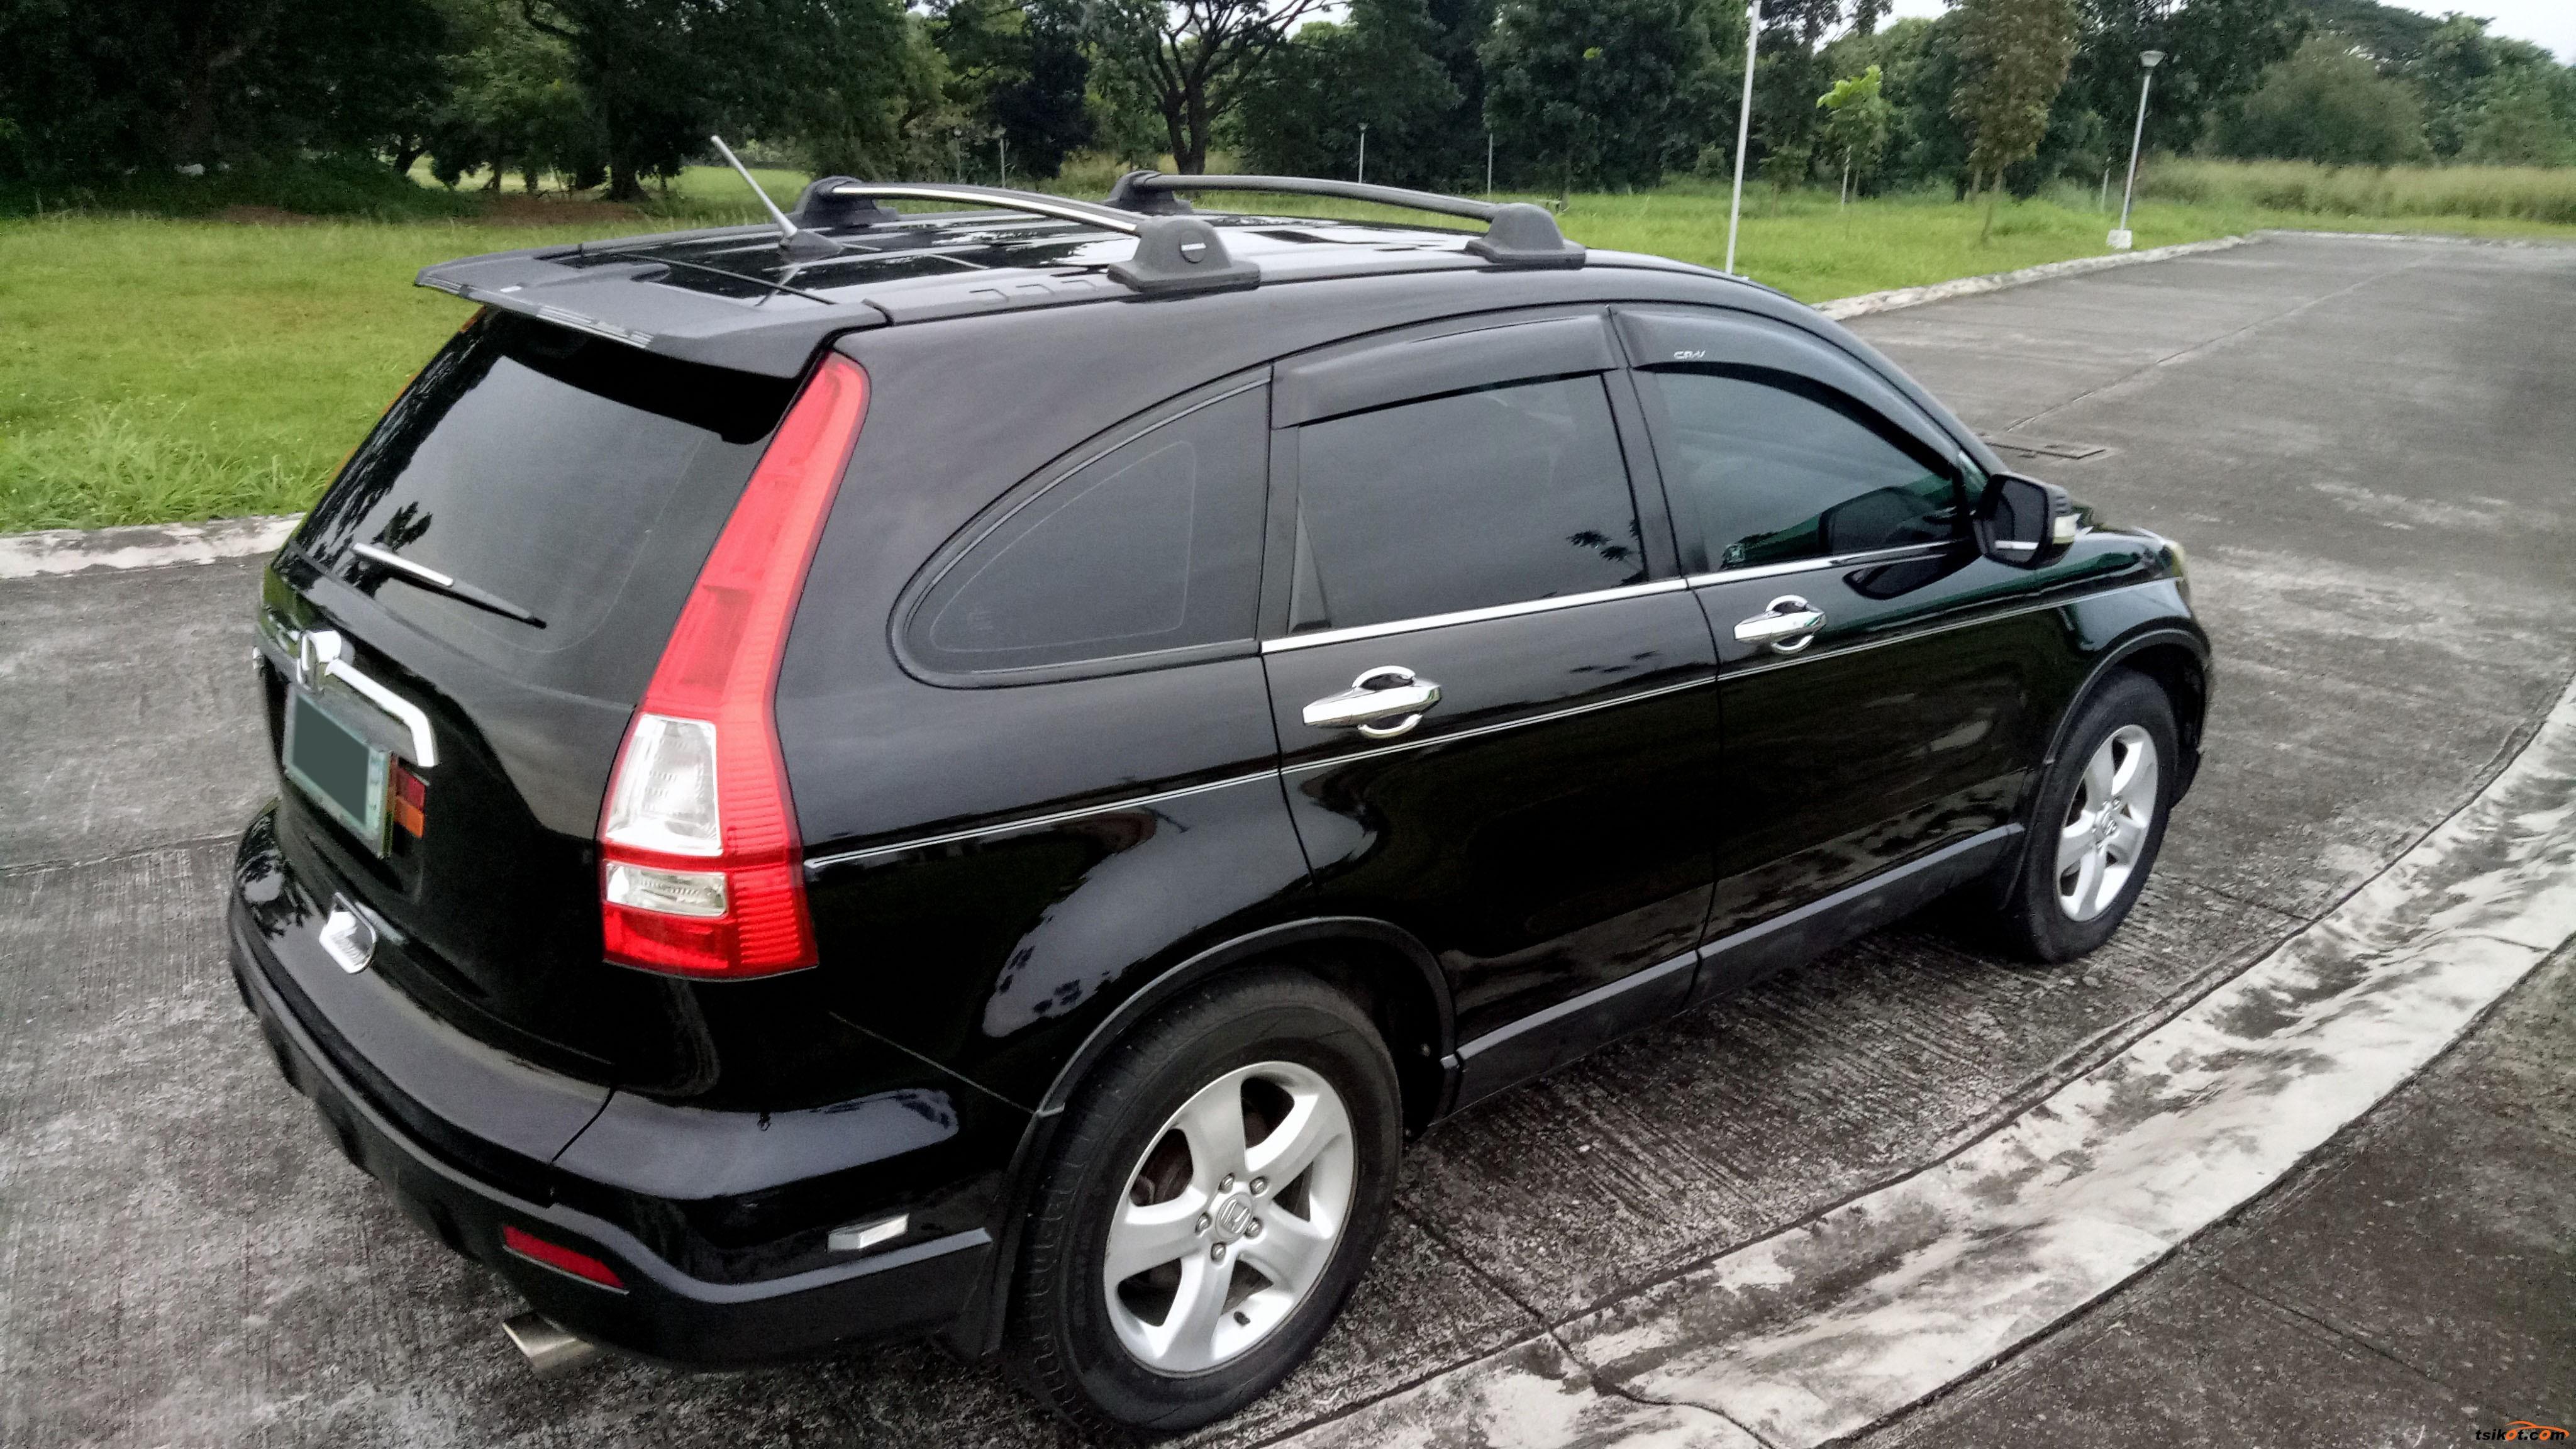 Honda Cr-V 2008 - Car for Sale Central Luzon